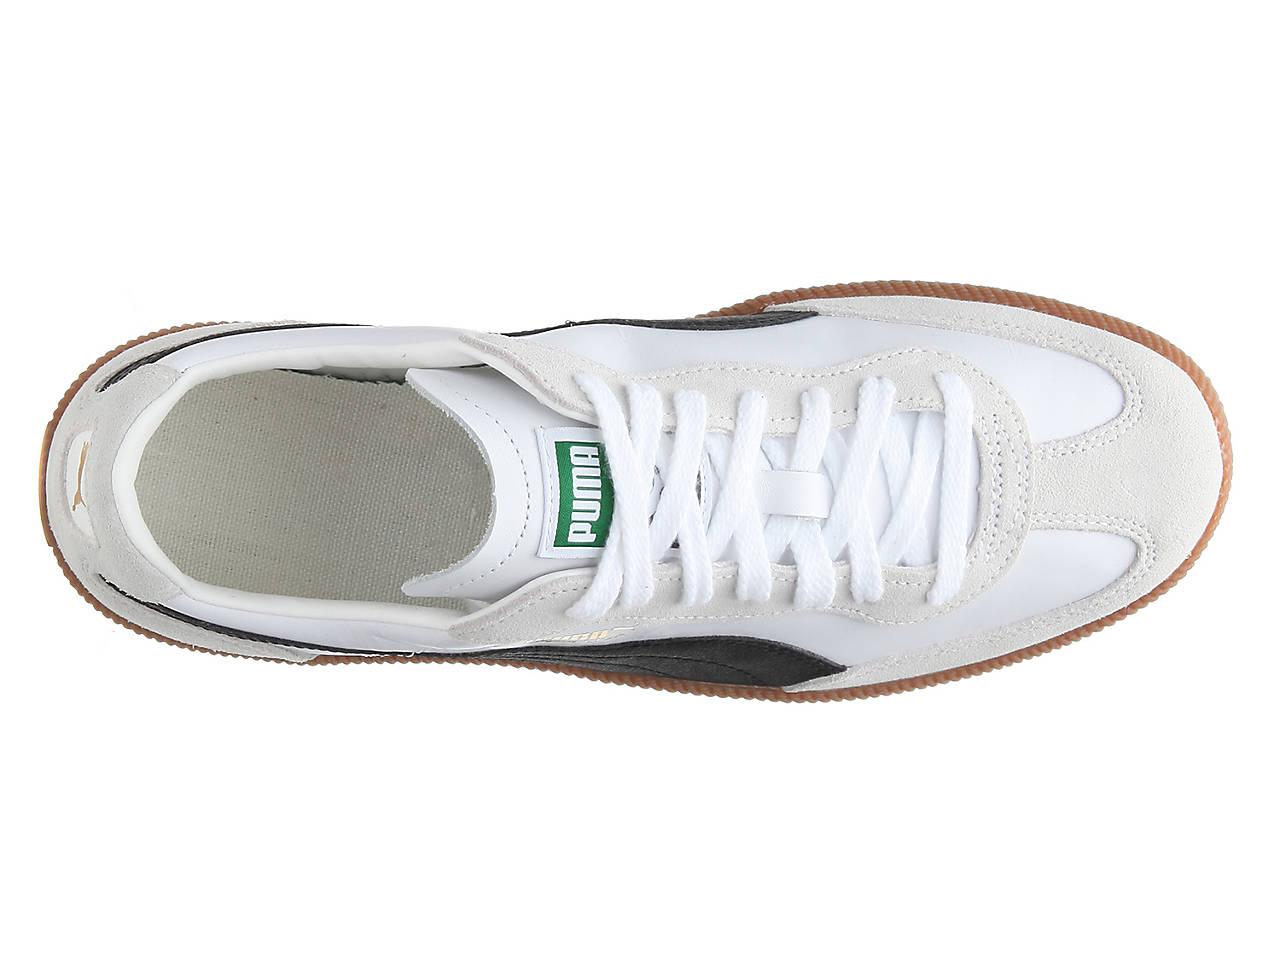 1849c10ad93bb0 Puma Super Liga OG Retro Sneaker - Men s Men s Shoes